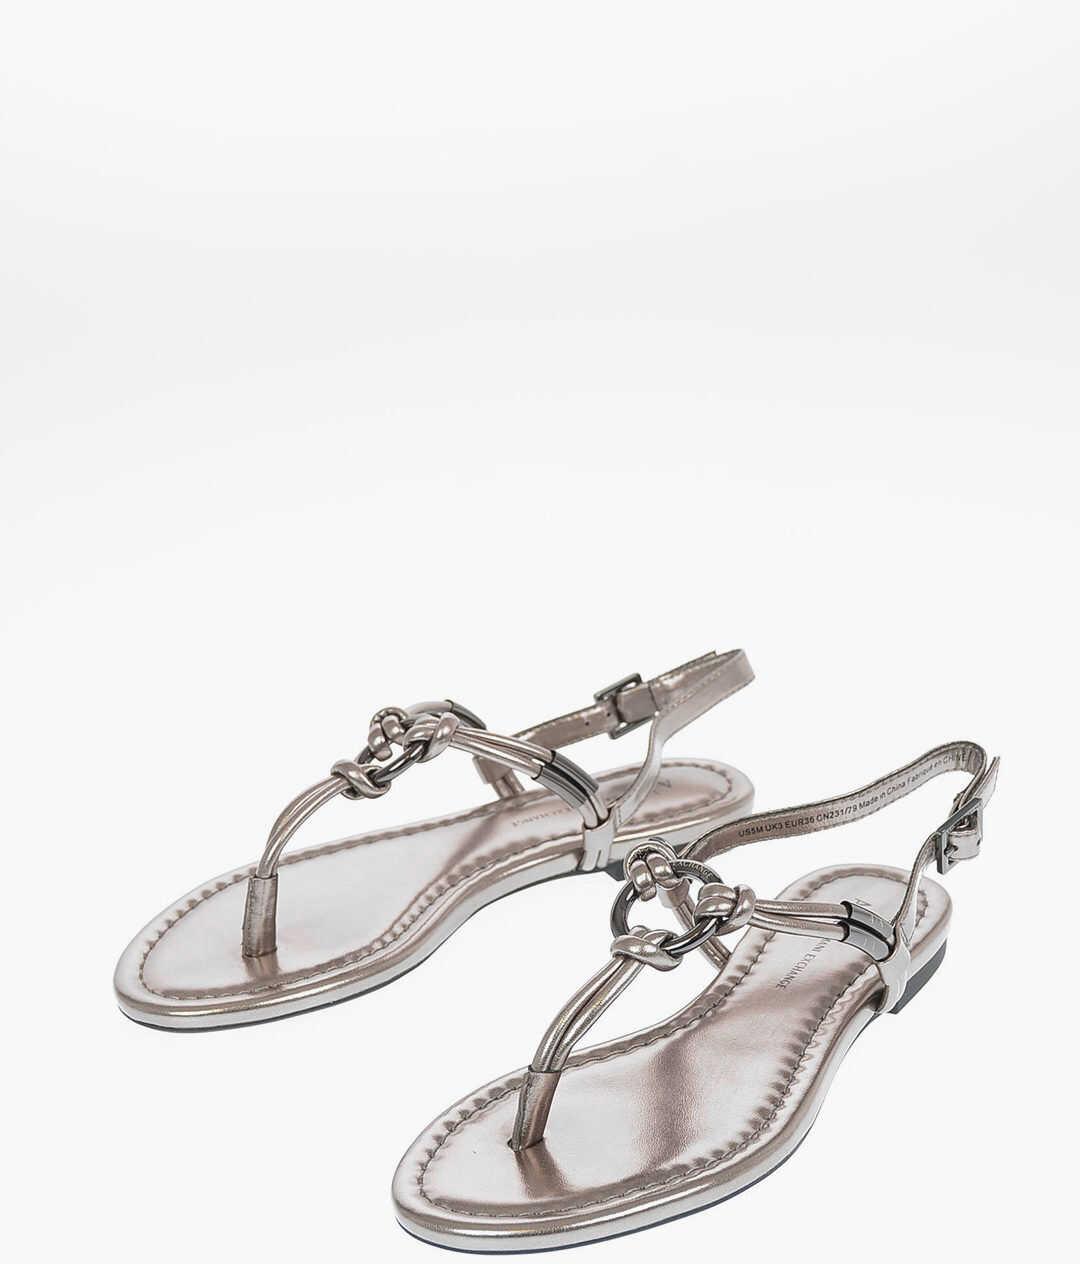 Armani ARMANI EXCHANGE Faux Leather Sandal SILVER imagine b-mall.ro